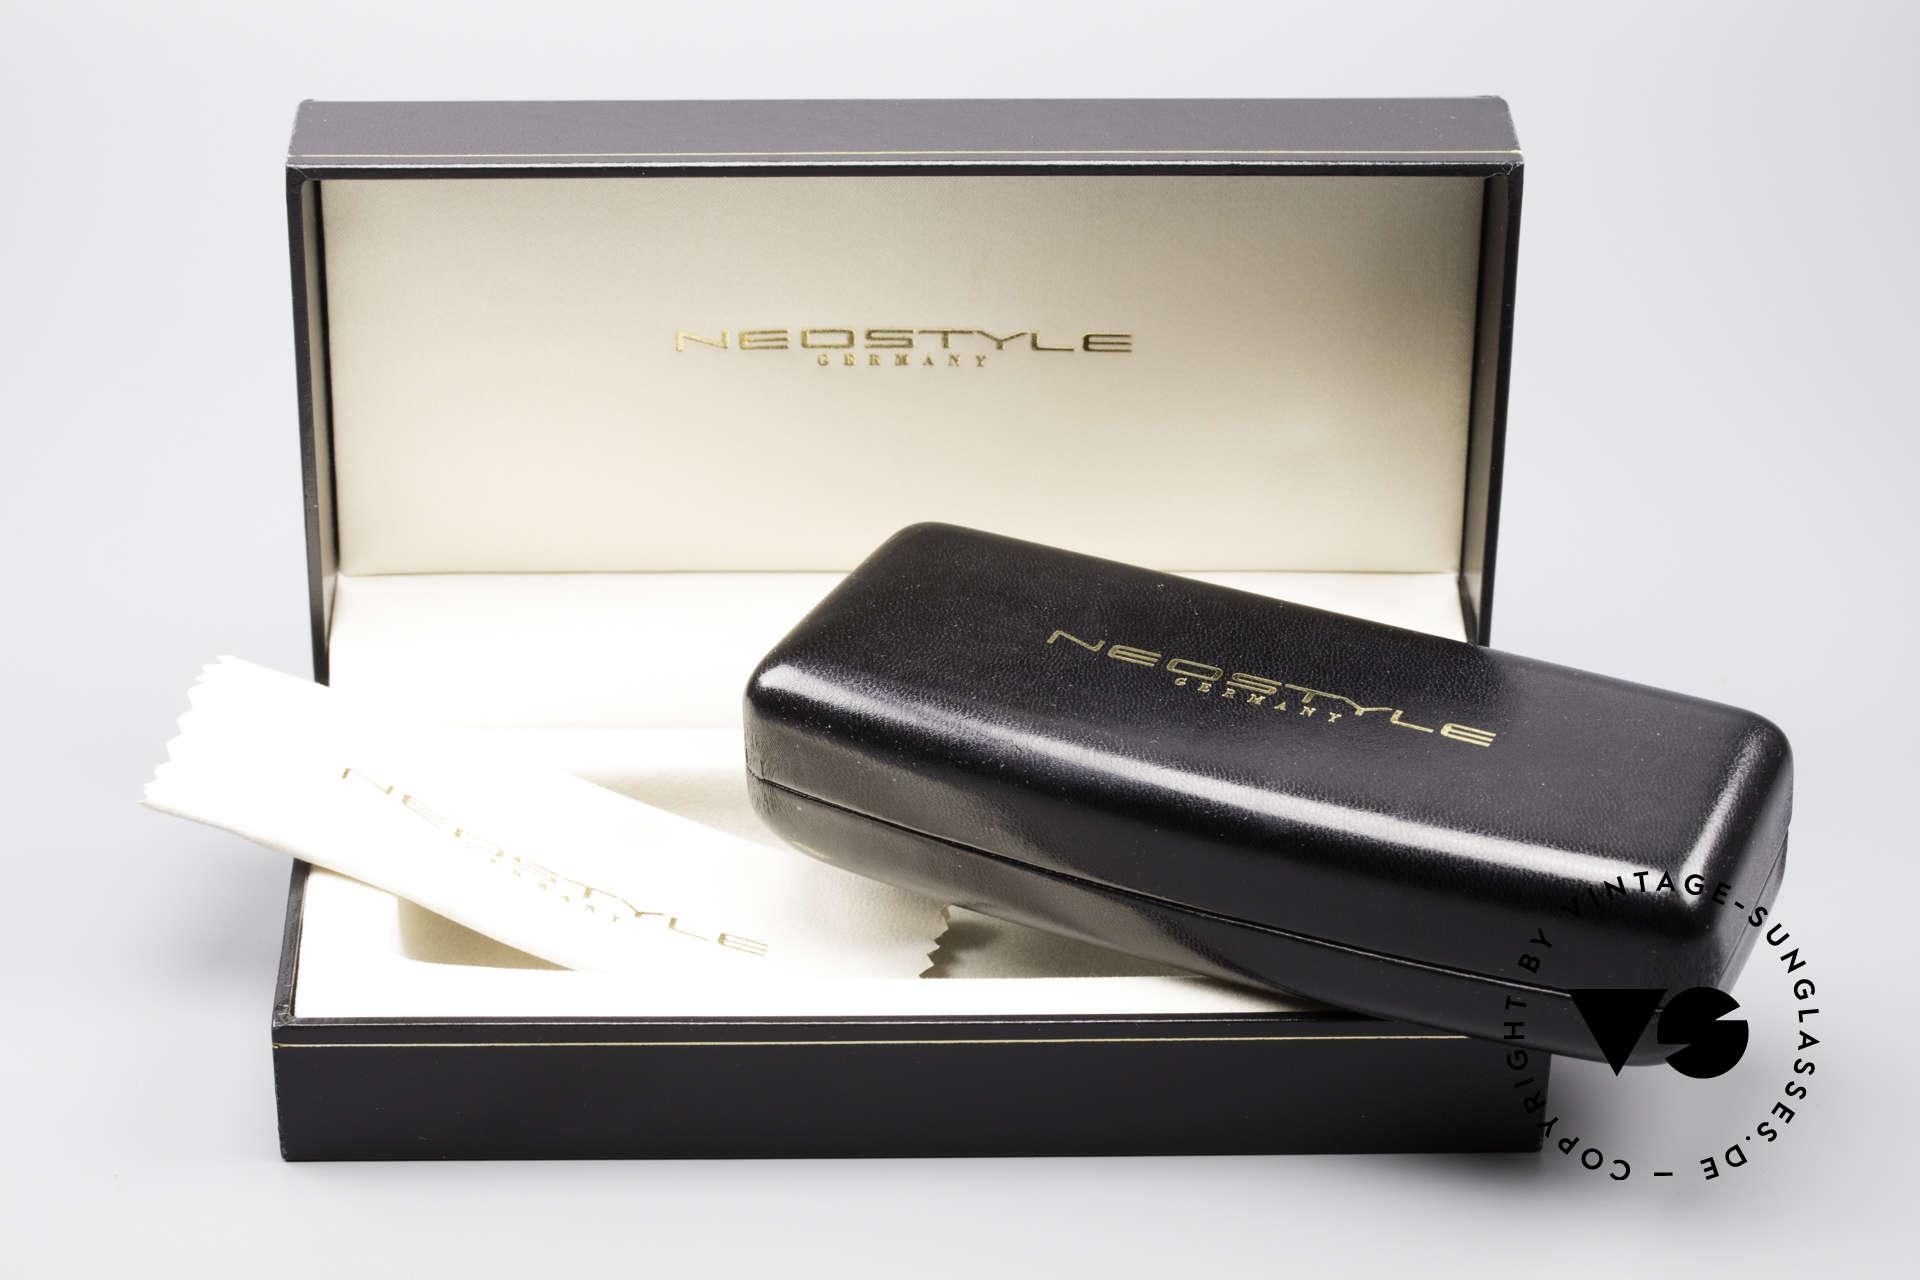 Neostyle Sunsport 1501 Titanflex Vintage Sunglasses, Size: medium, Made for Men